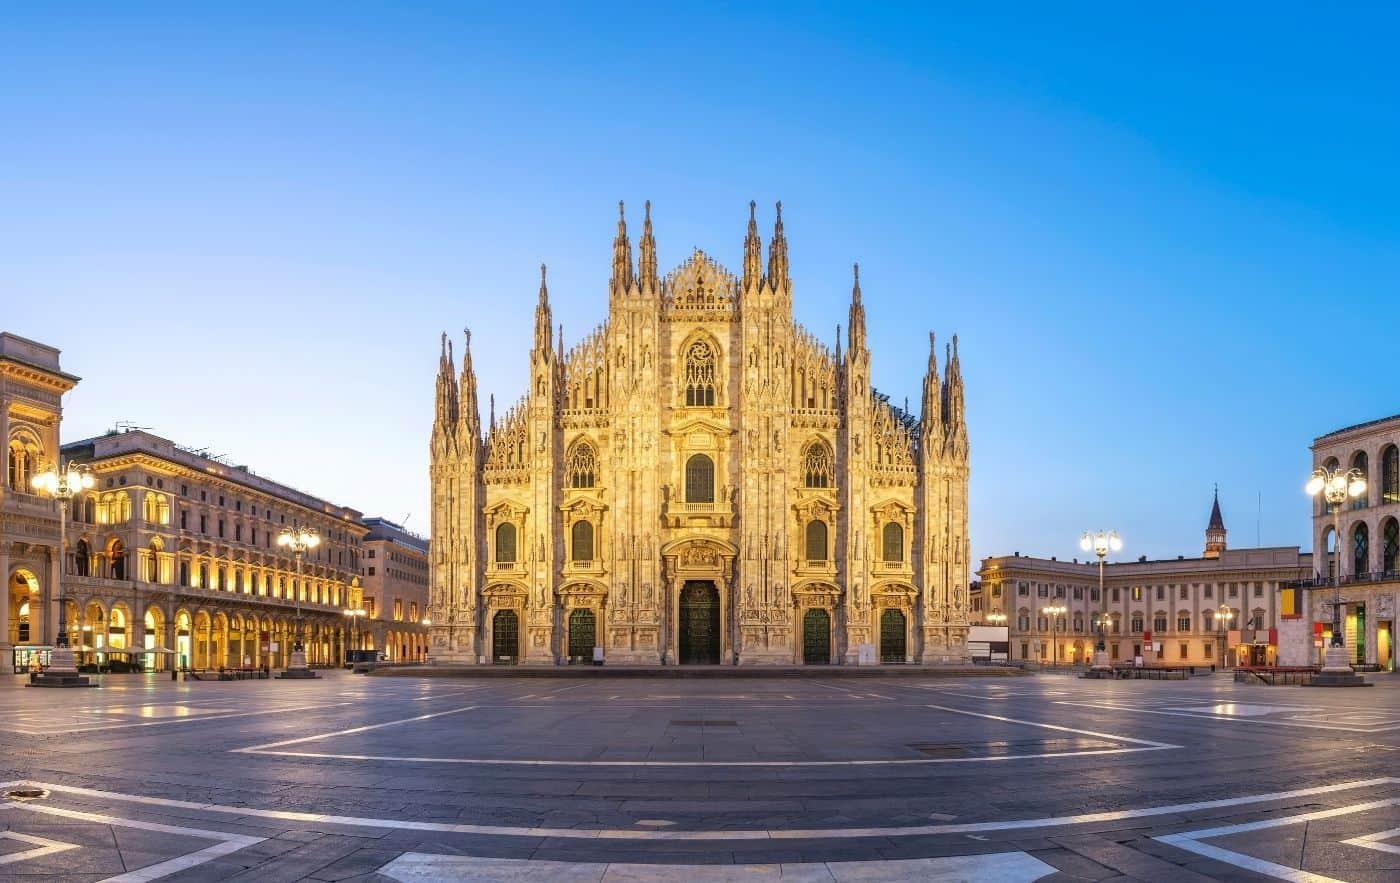 Exterior of the Duomo di Milano in Milan.